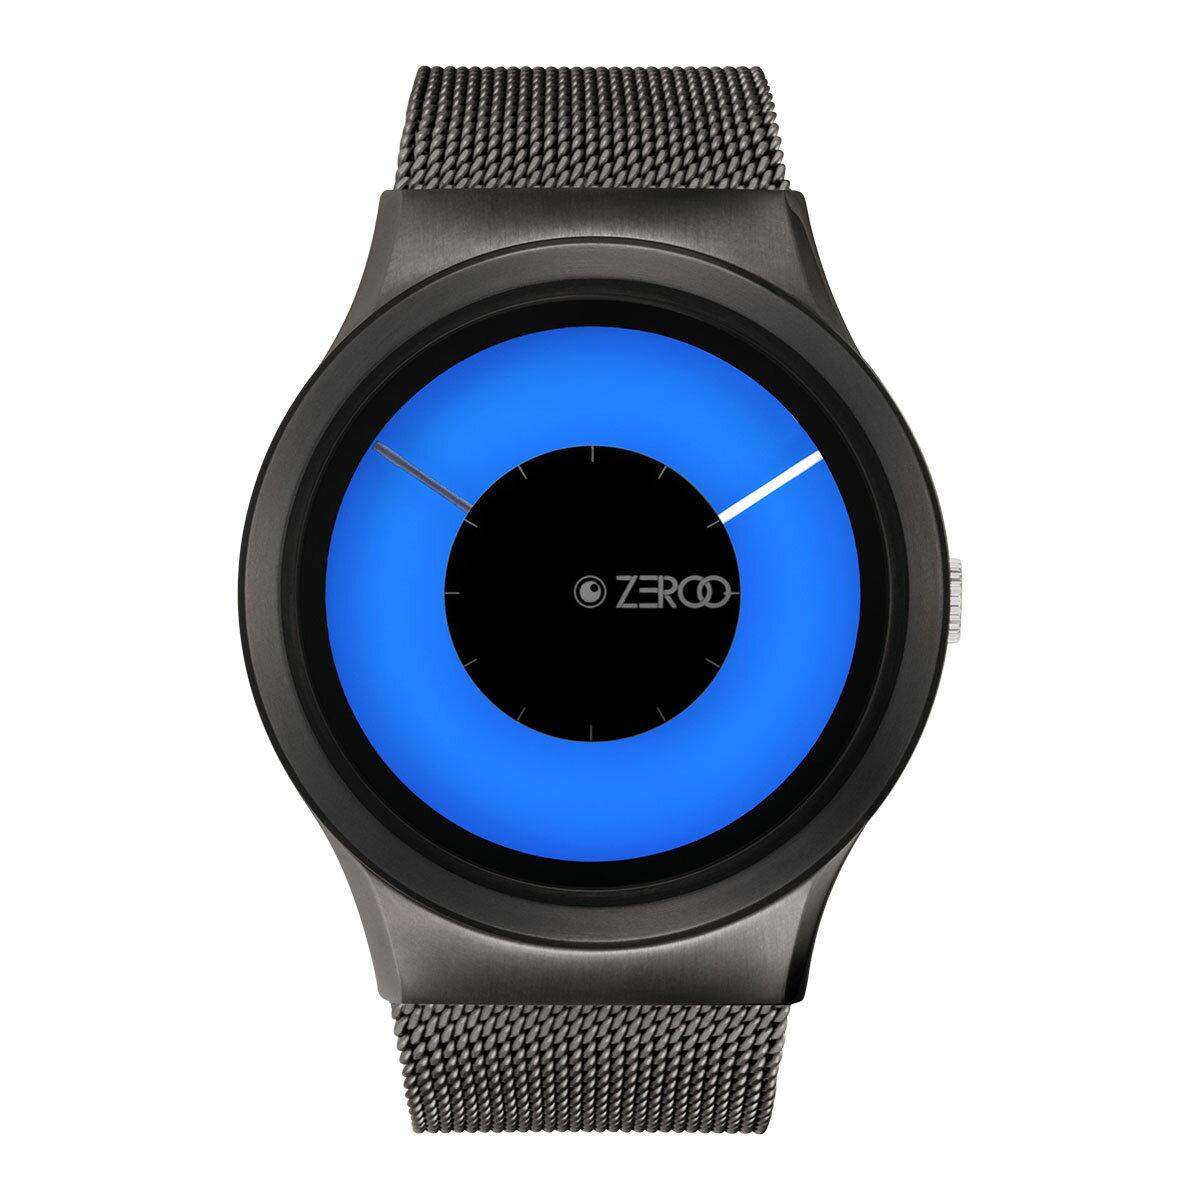 ZEROO MAGIA AURORA ゼロ 電池式クォーツ 腕時計 [W11026B02SM02] ブルー デザインウォッチ ペア用 メンズ レディース ユニセックス おしゃれ時計 デザイナーズ